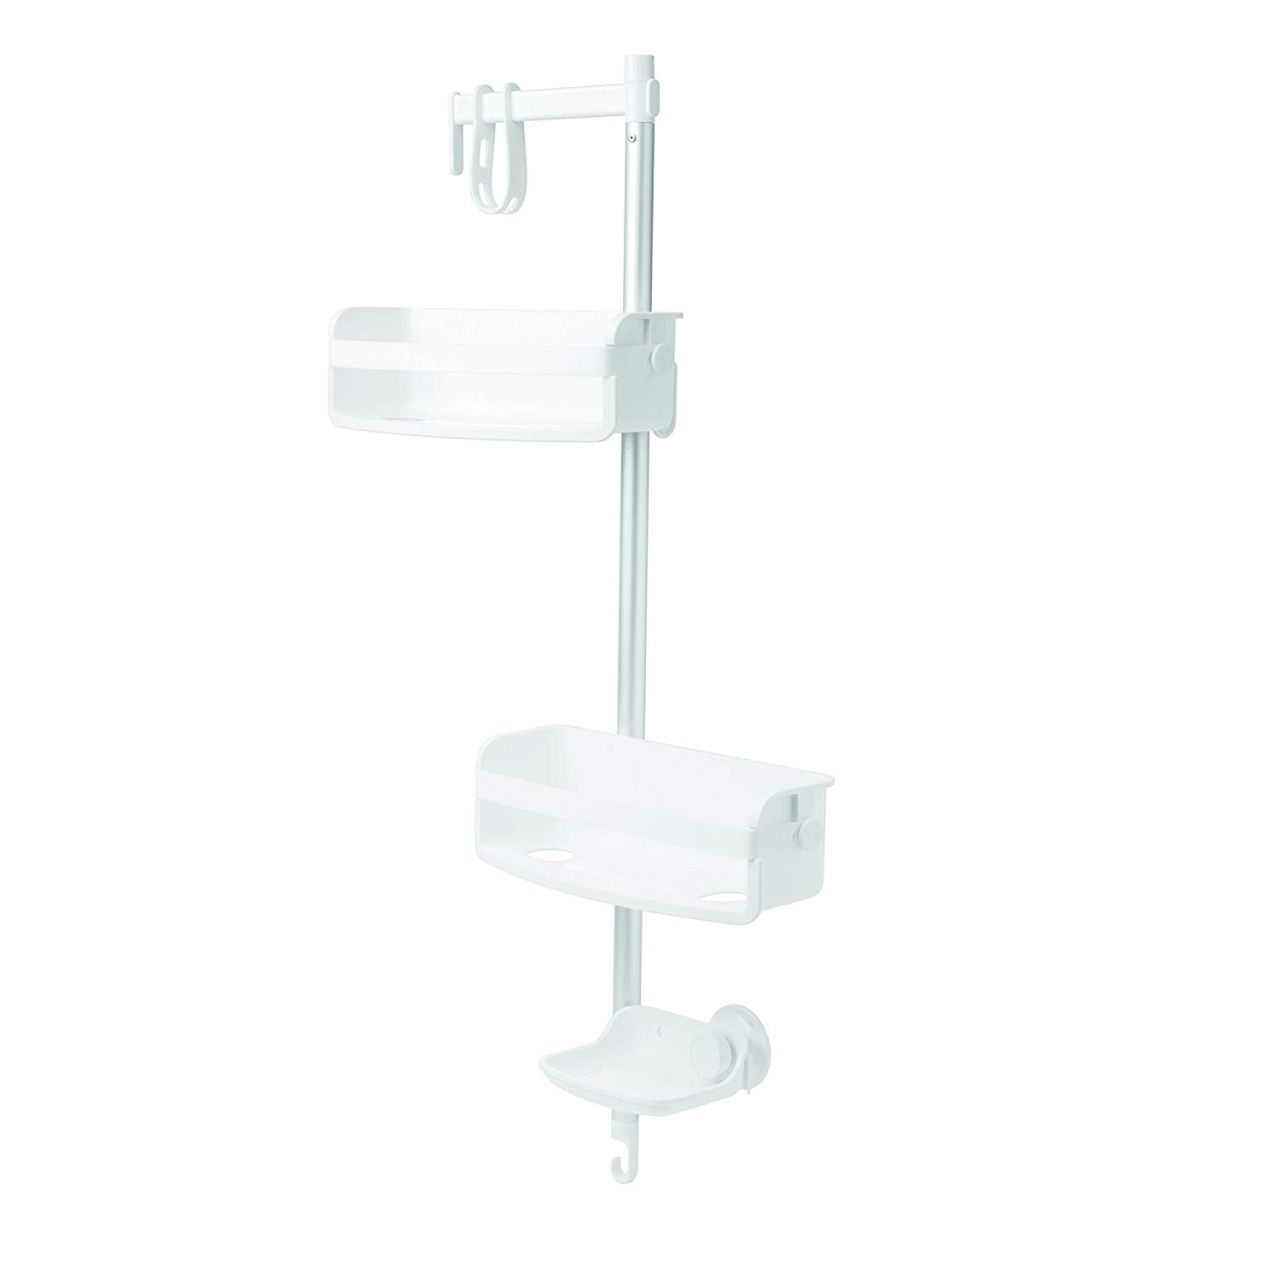 e433928db8da Umbra Flipside Flex Pole Shower Caddy(フリップサイド シャワーキャディー)